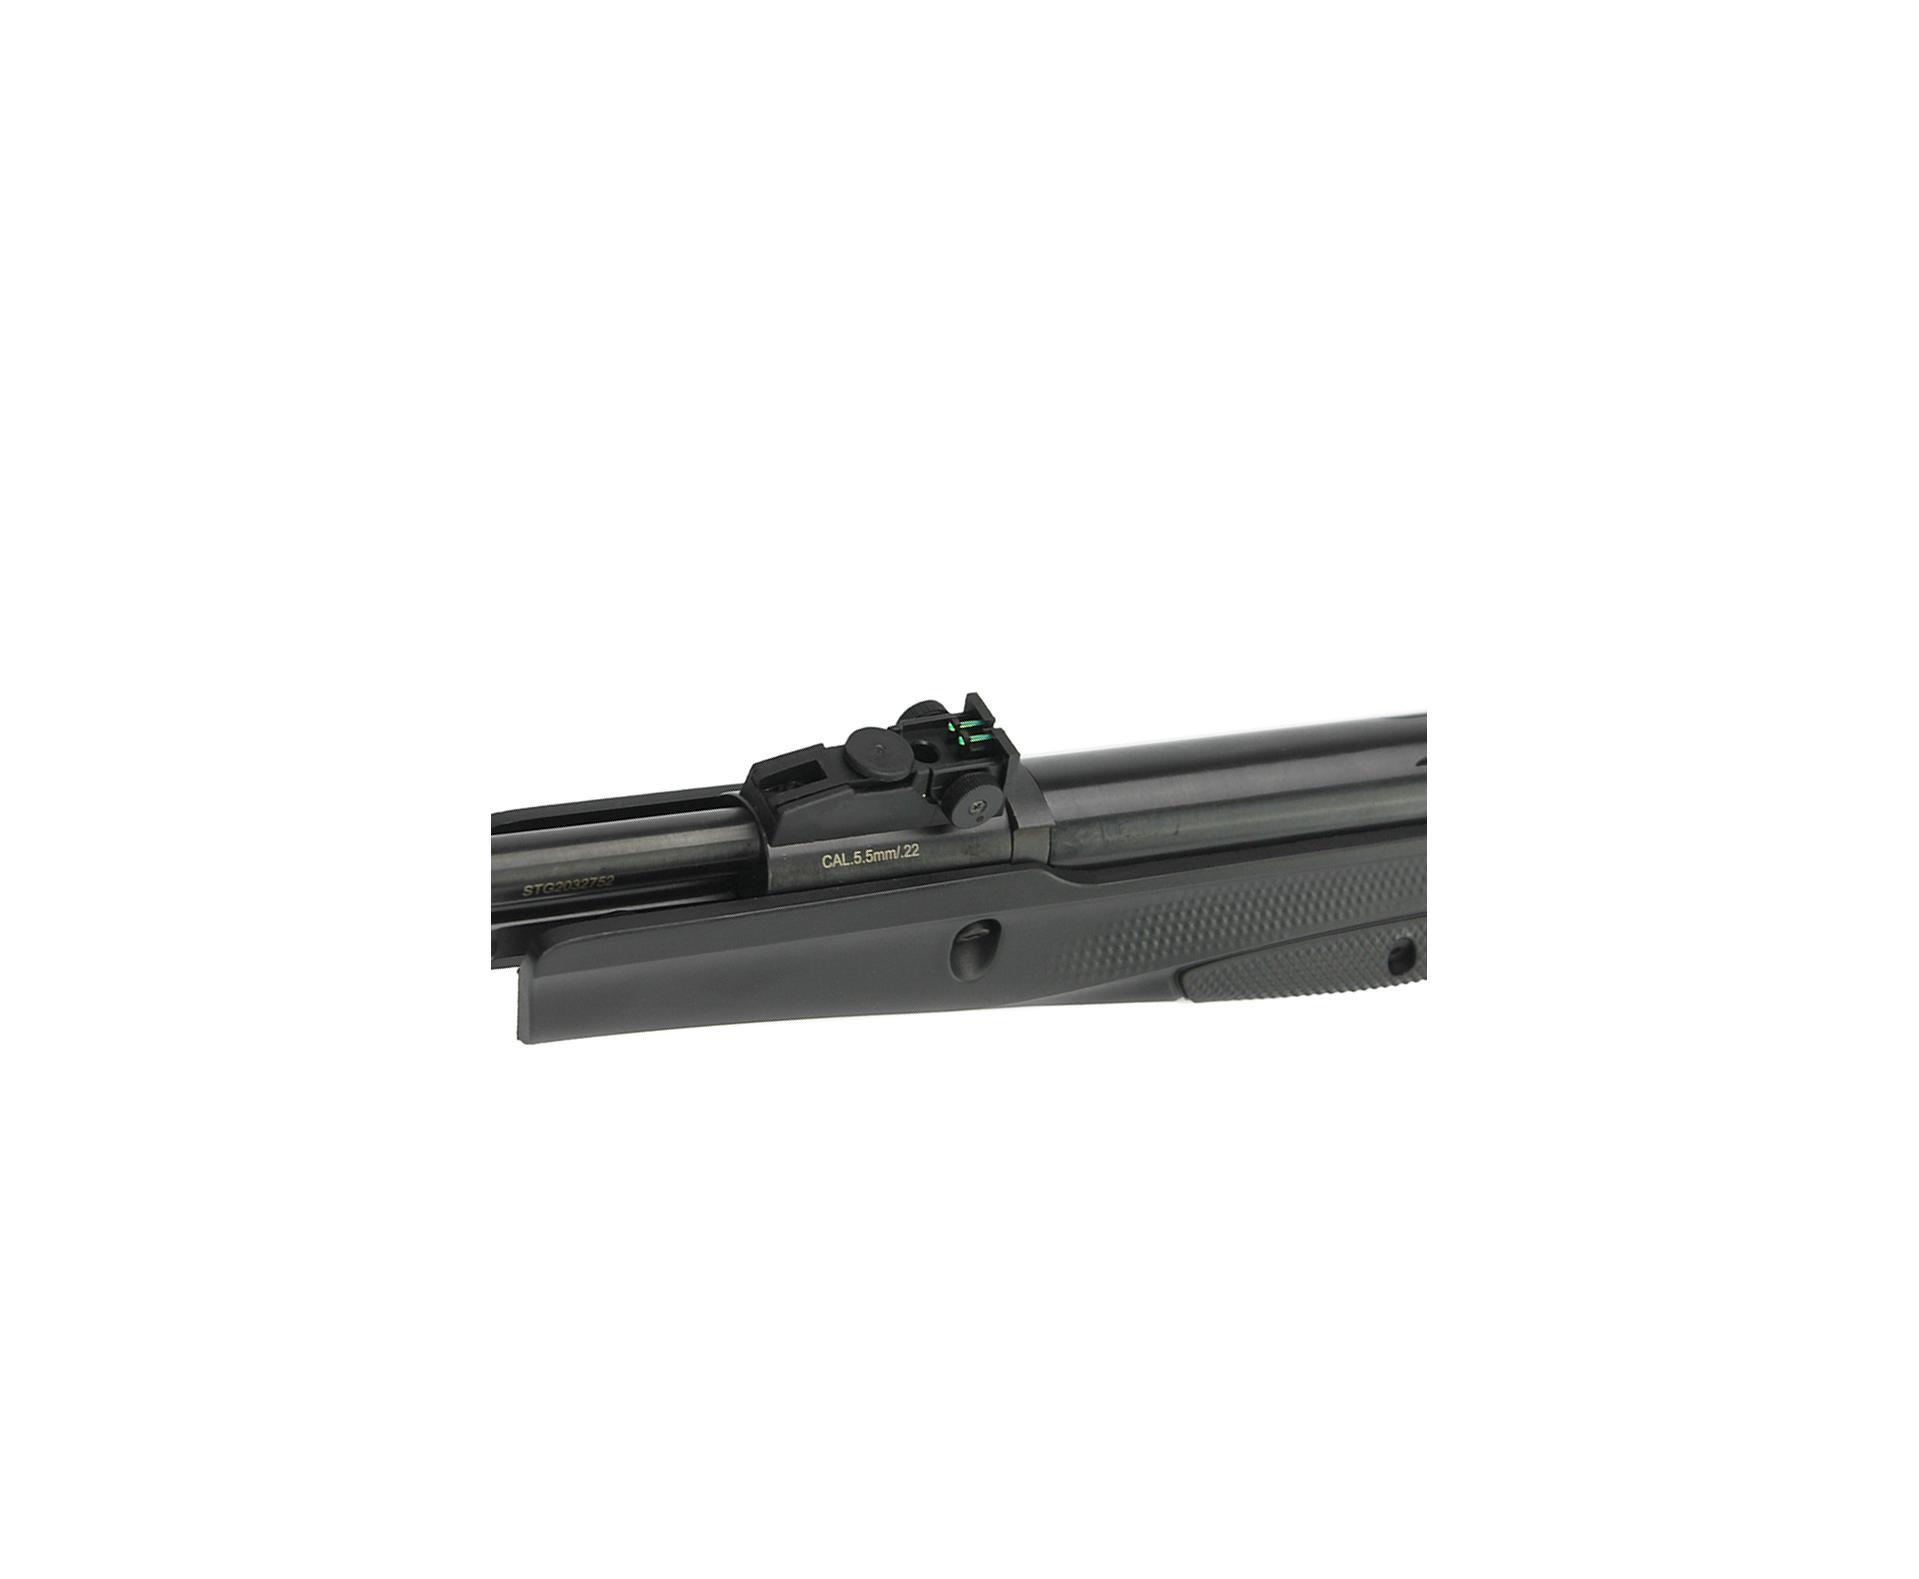 Carabina De Pressão Stoeger Rx40 Nitro 5.5mm Beretta - Fxr